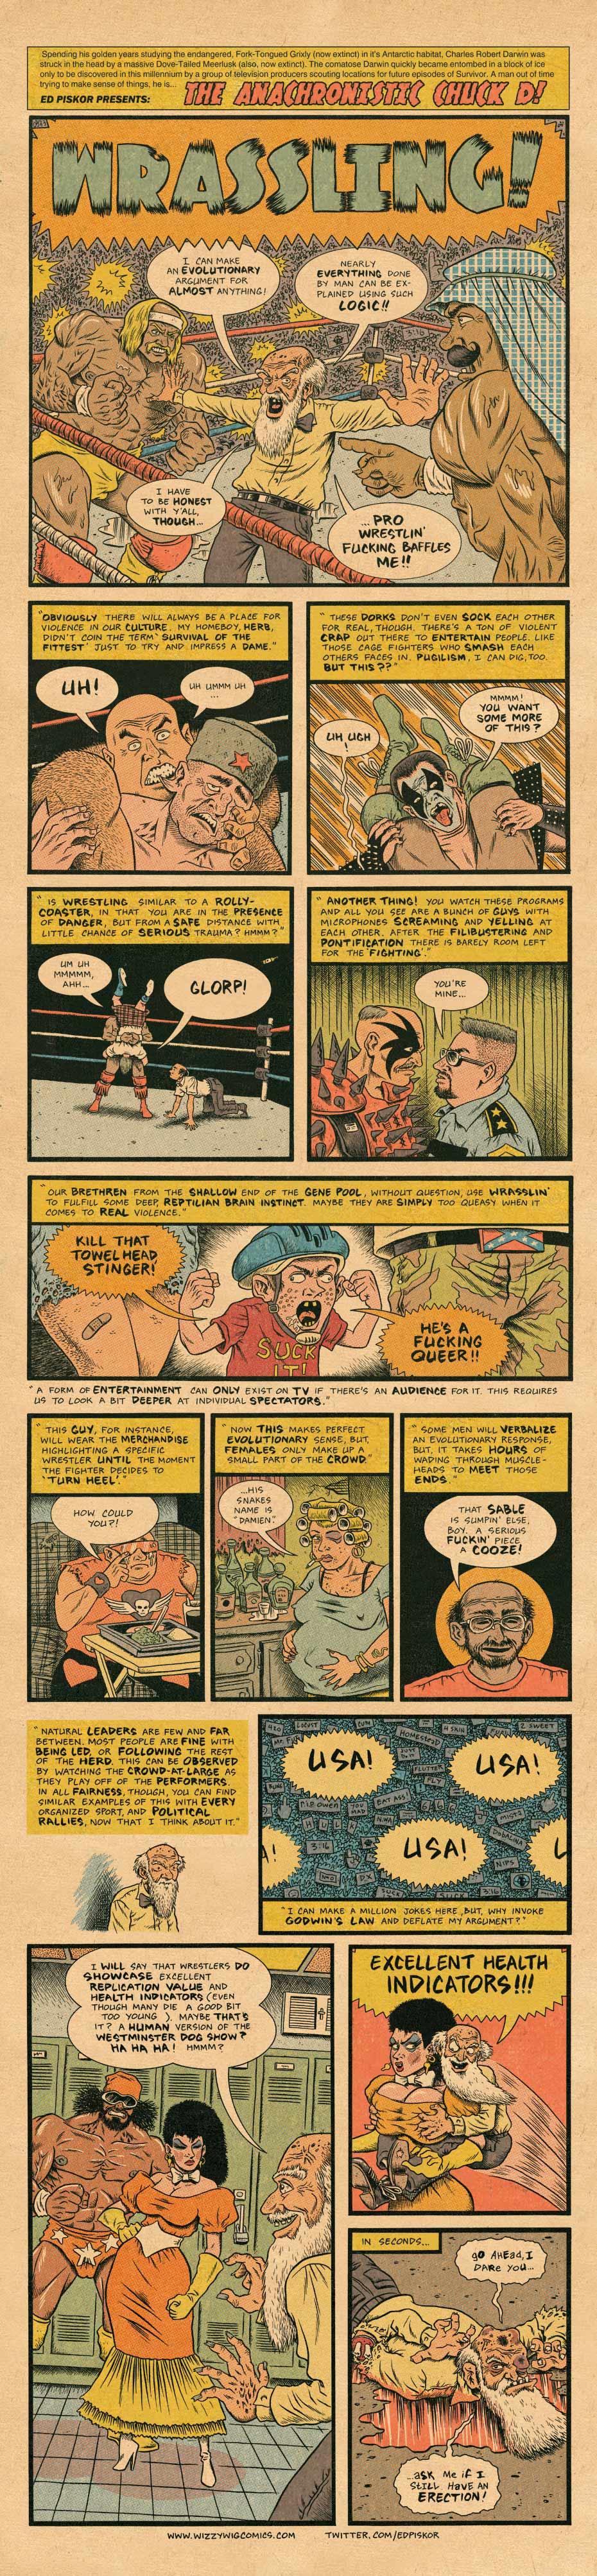 wrestling-strip